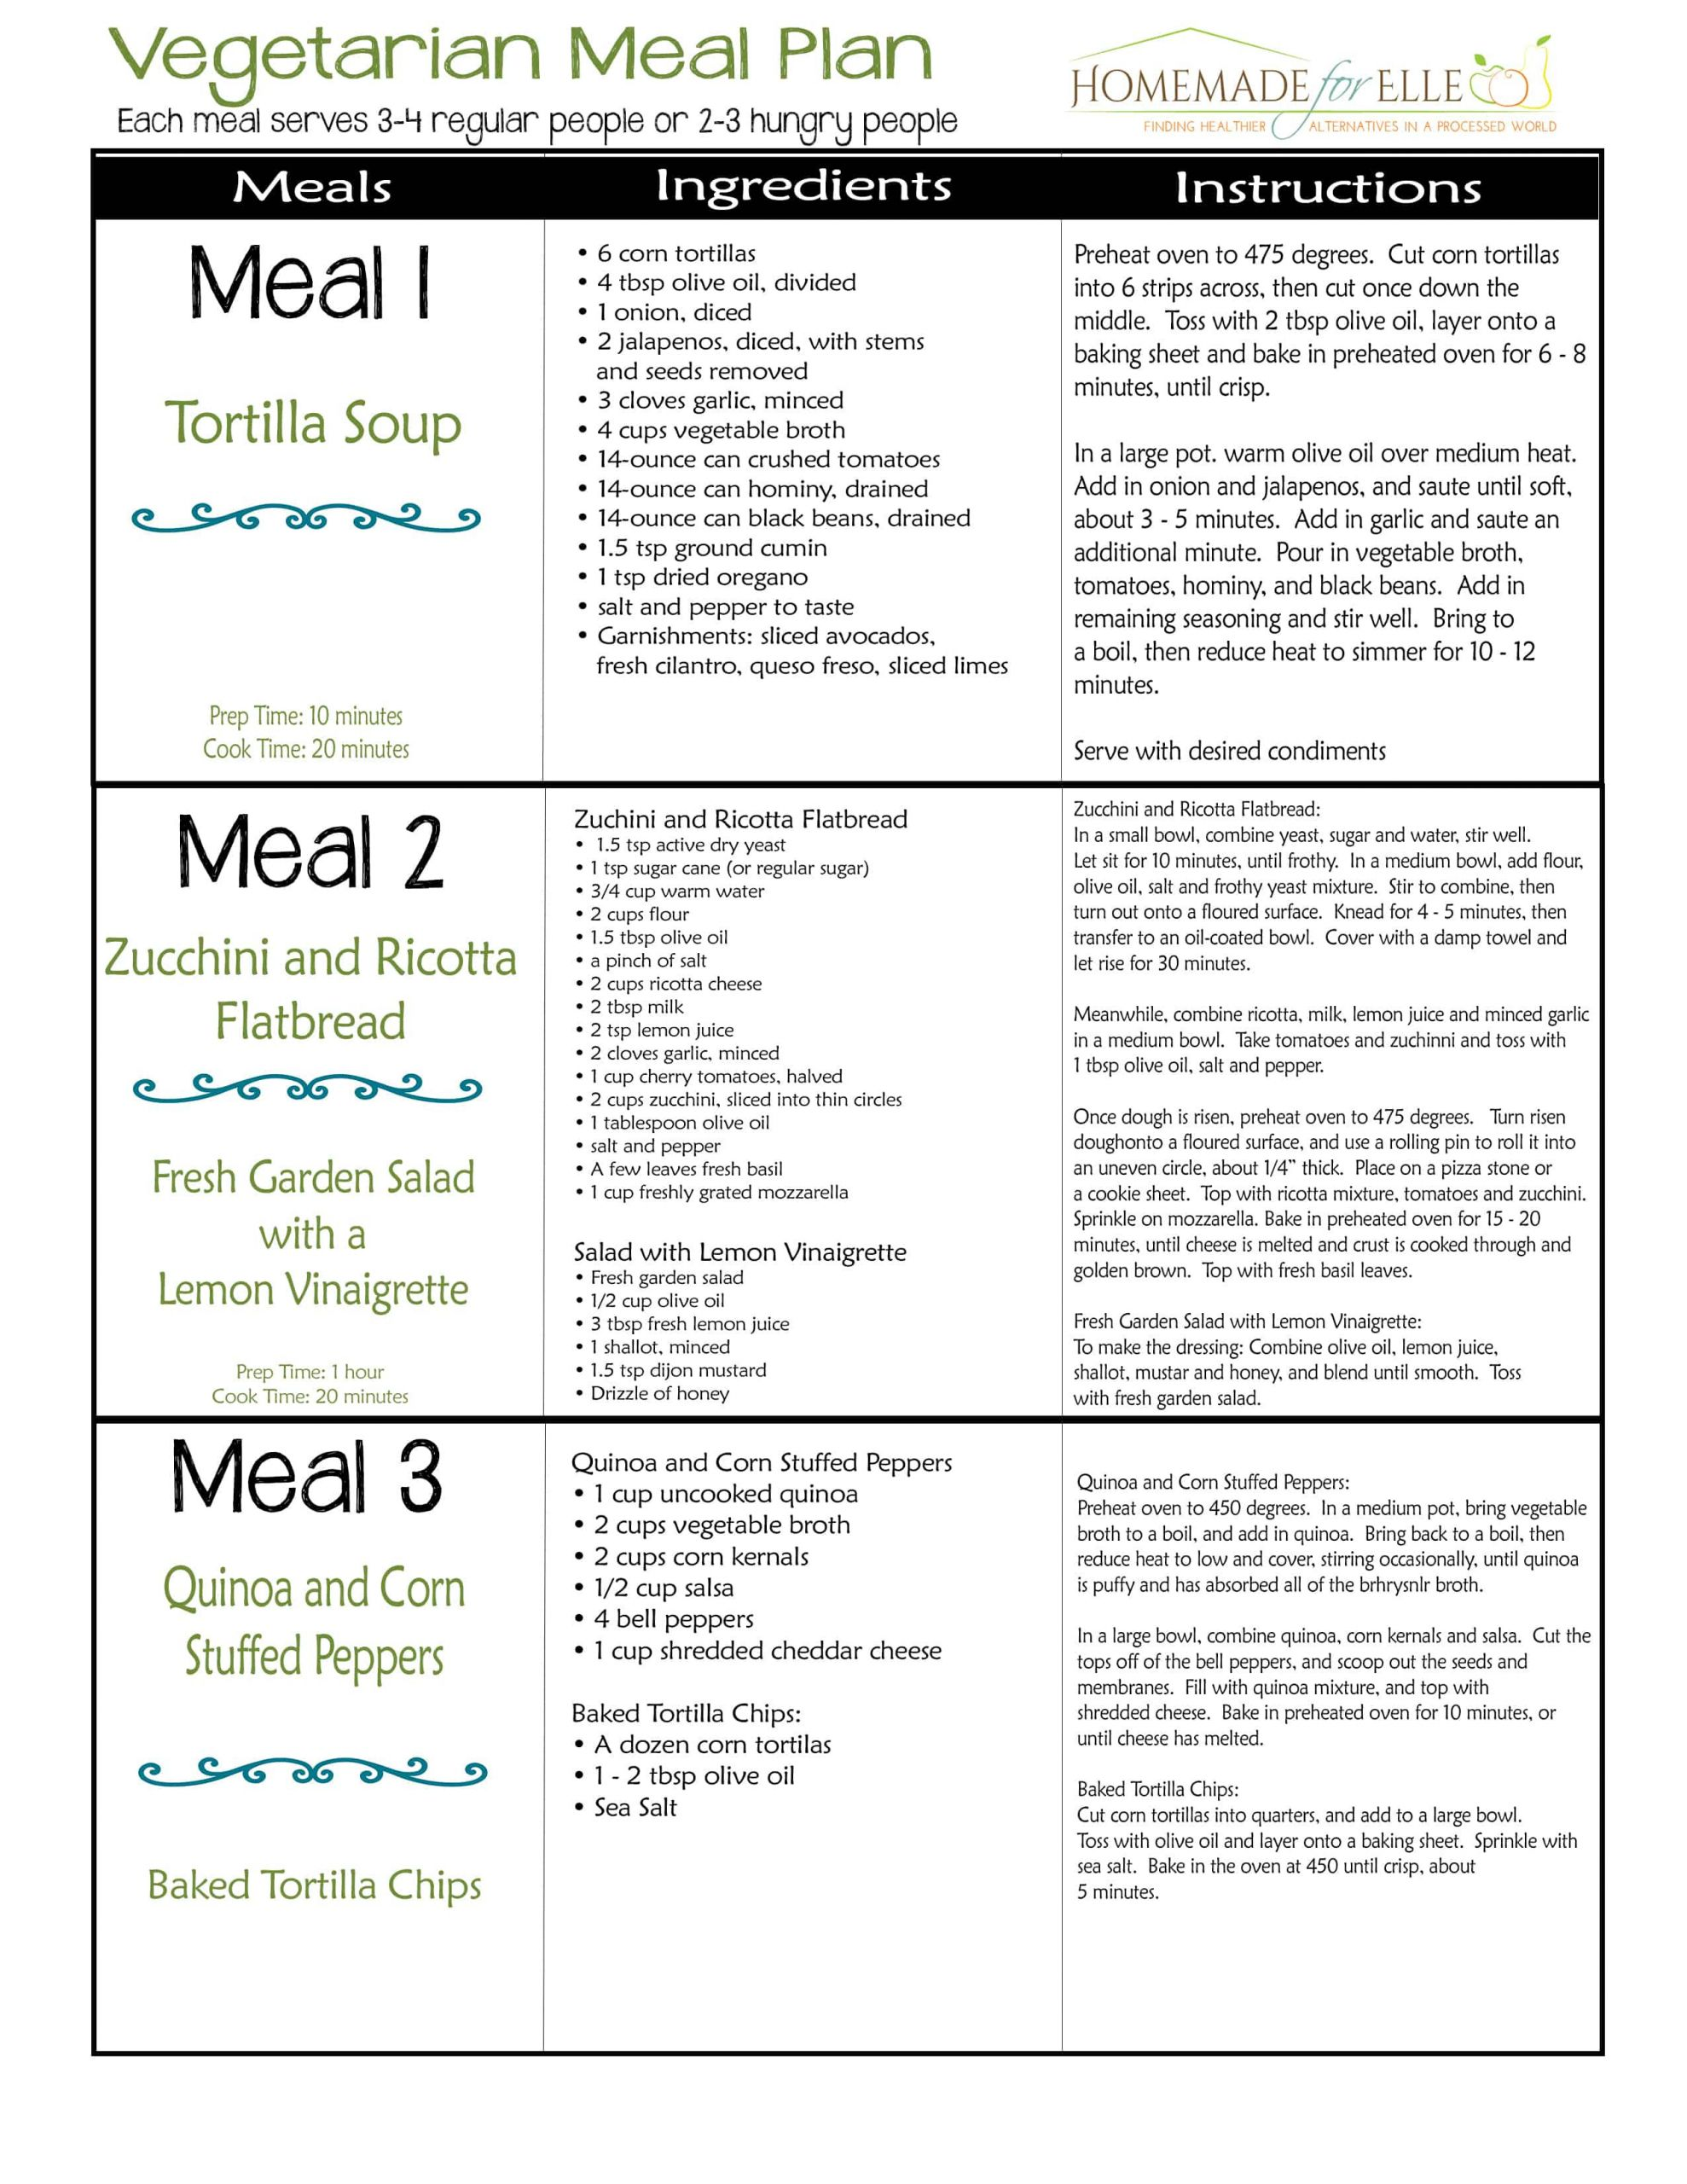 Vegan Diet Plan  ve arian meal plan page 1 ⋆ Homemade for Elle